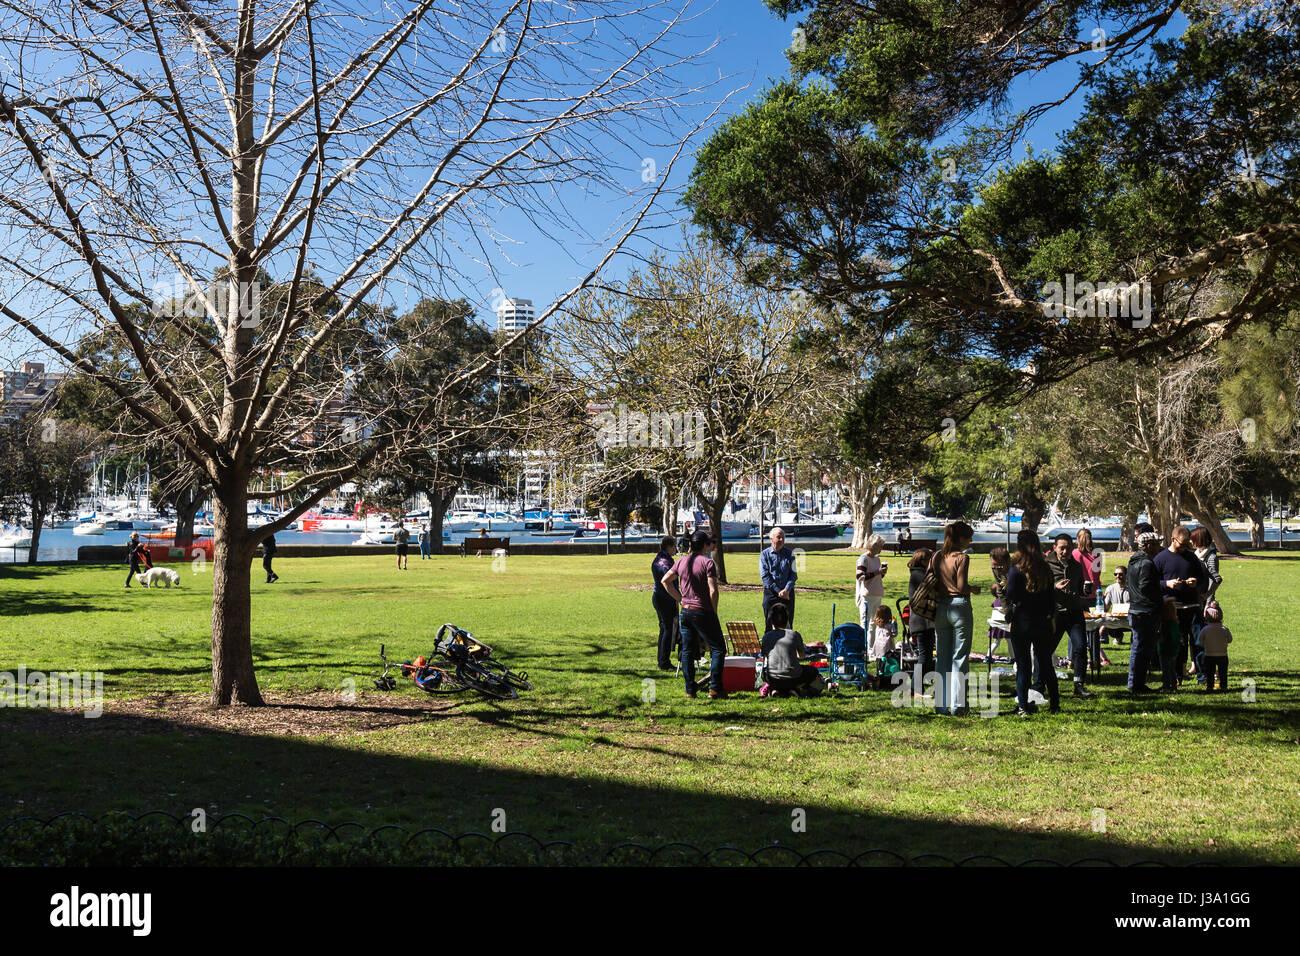 People enjoying Rushcutters Bay, Sydney. Stock Photo